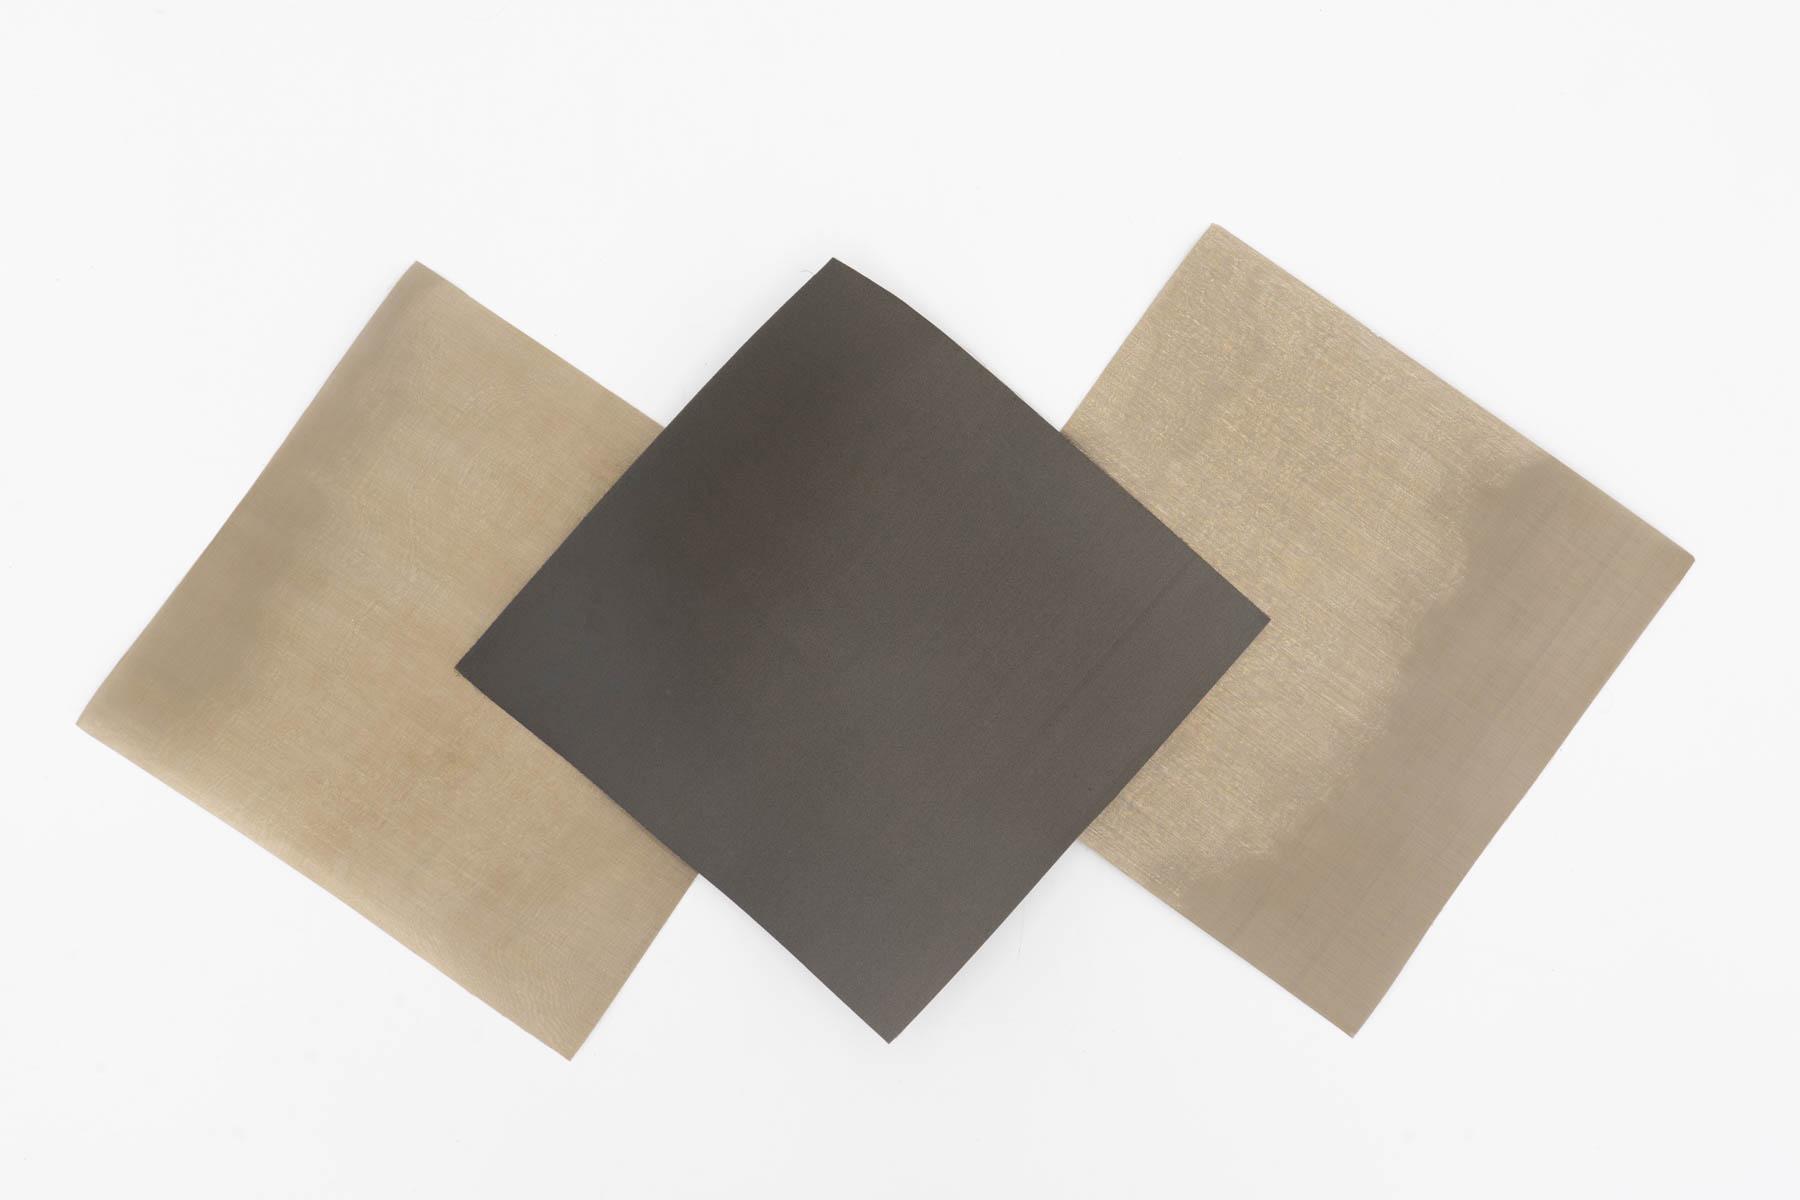 noise canceling mesh squares